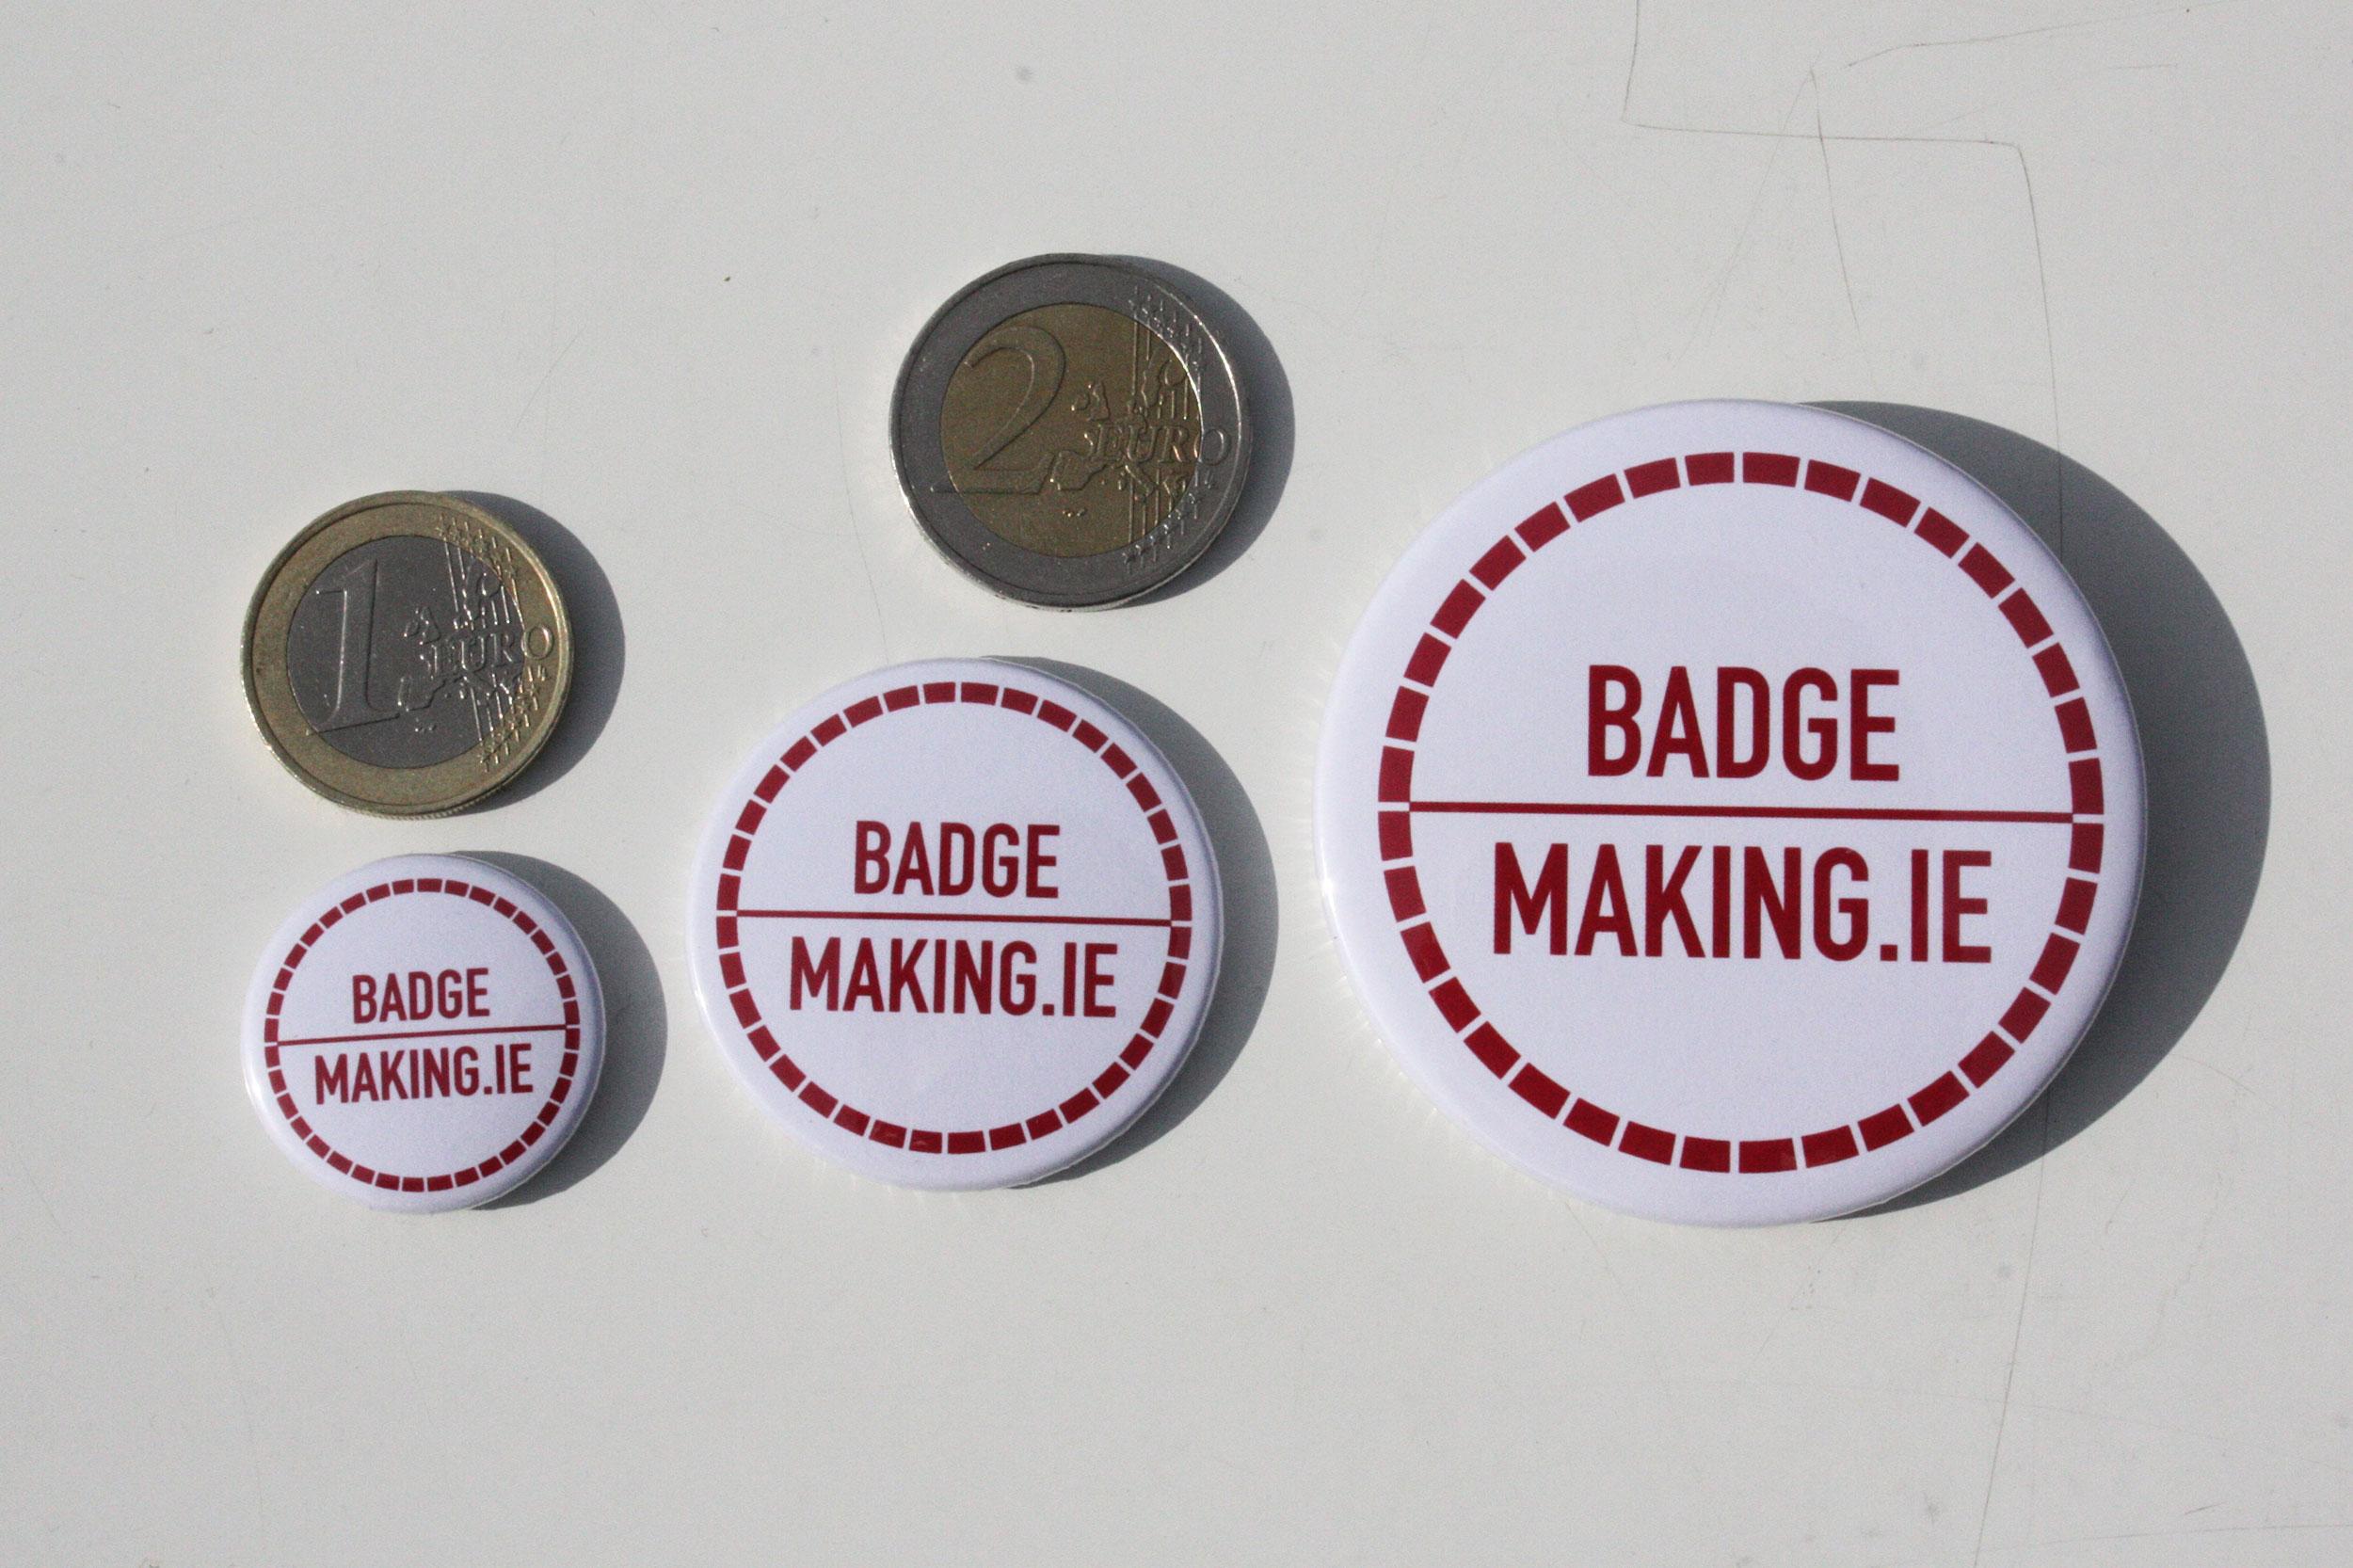 badgefronts.jpg